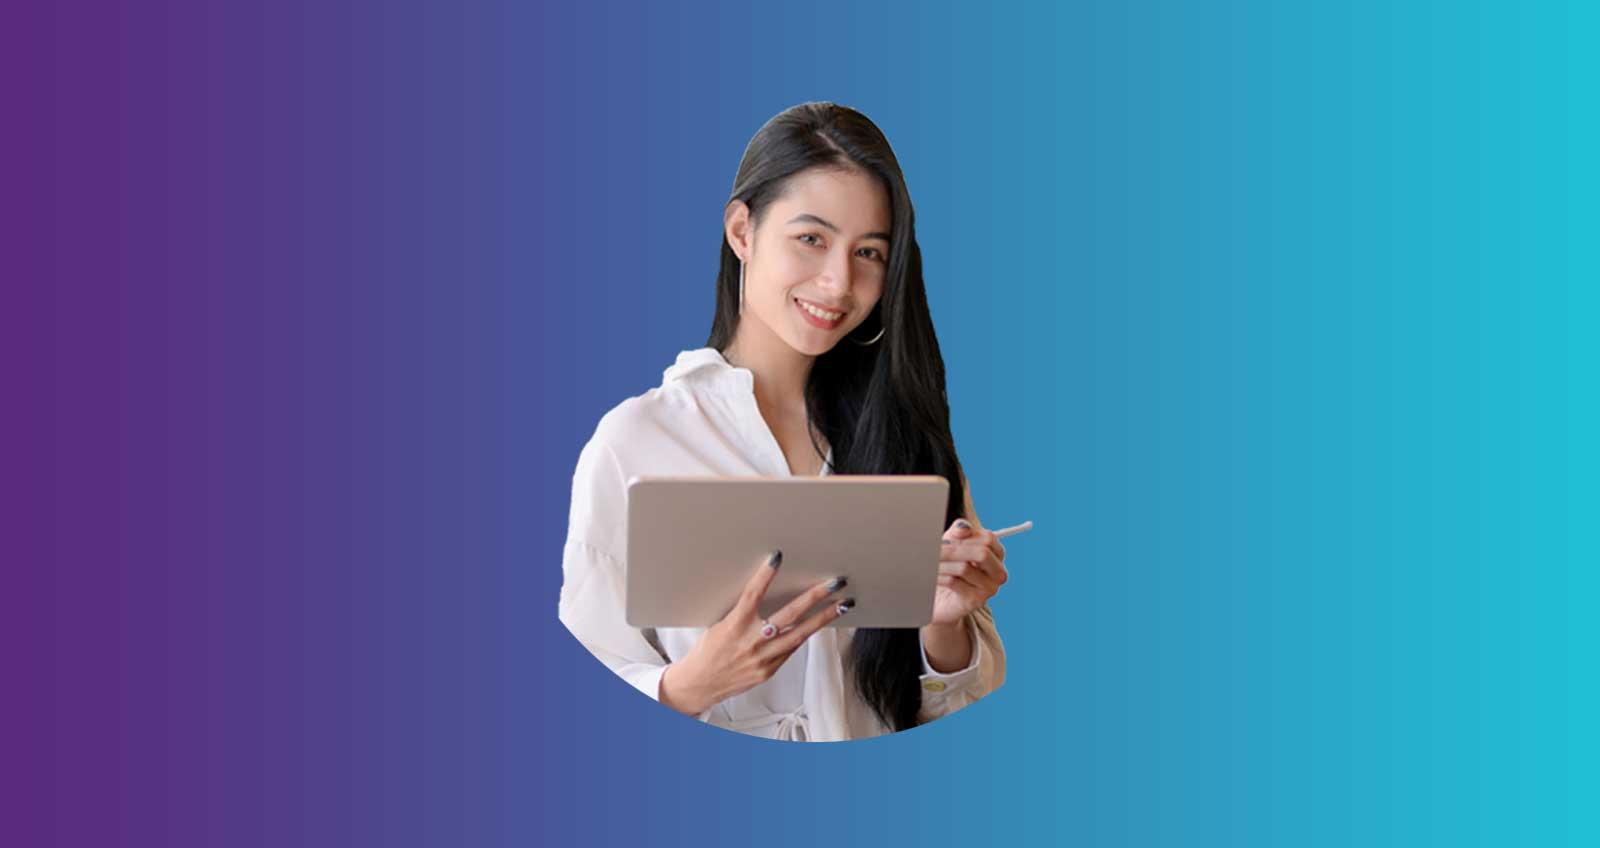 online learning programs-ialf-learn english online-ielts prep online-university preparation online-academic pathway online